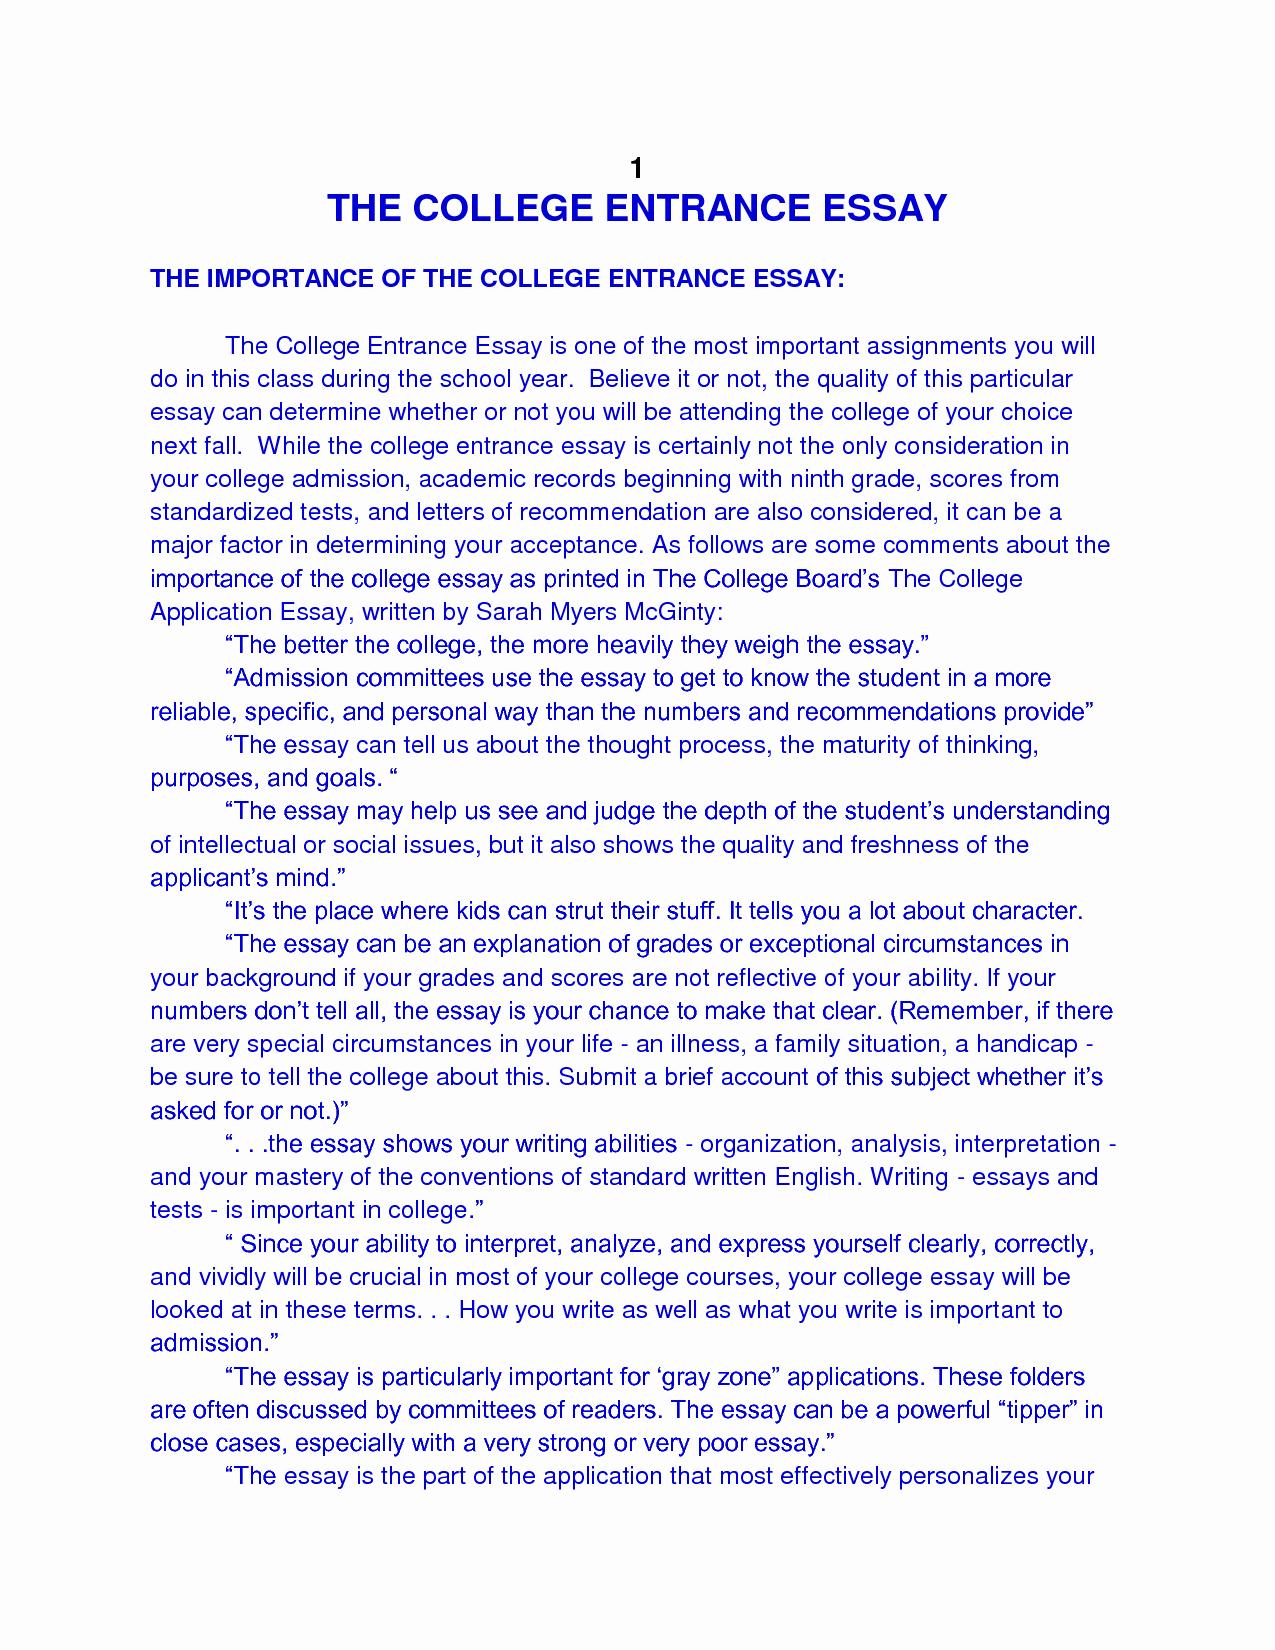 Mla format for College Essay Inspirational 49 College Entrance Essay Samples format for College